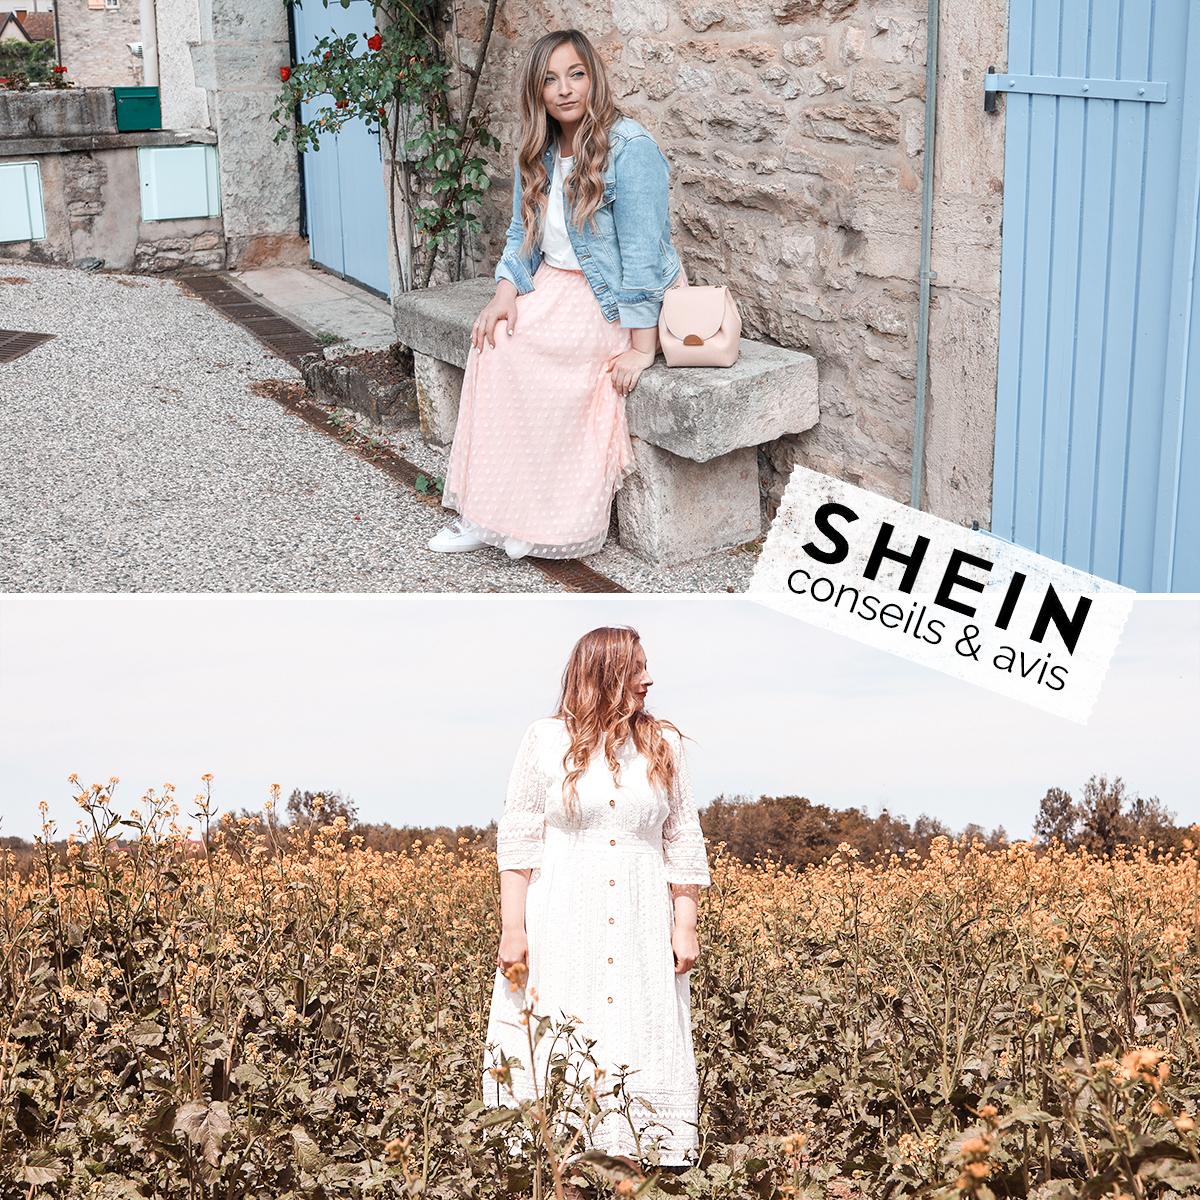 Shein Conseils Avis Julie